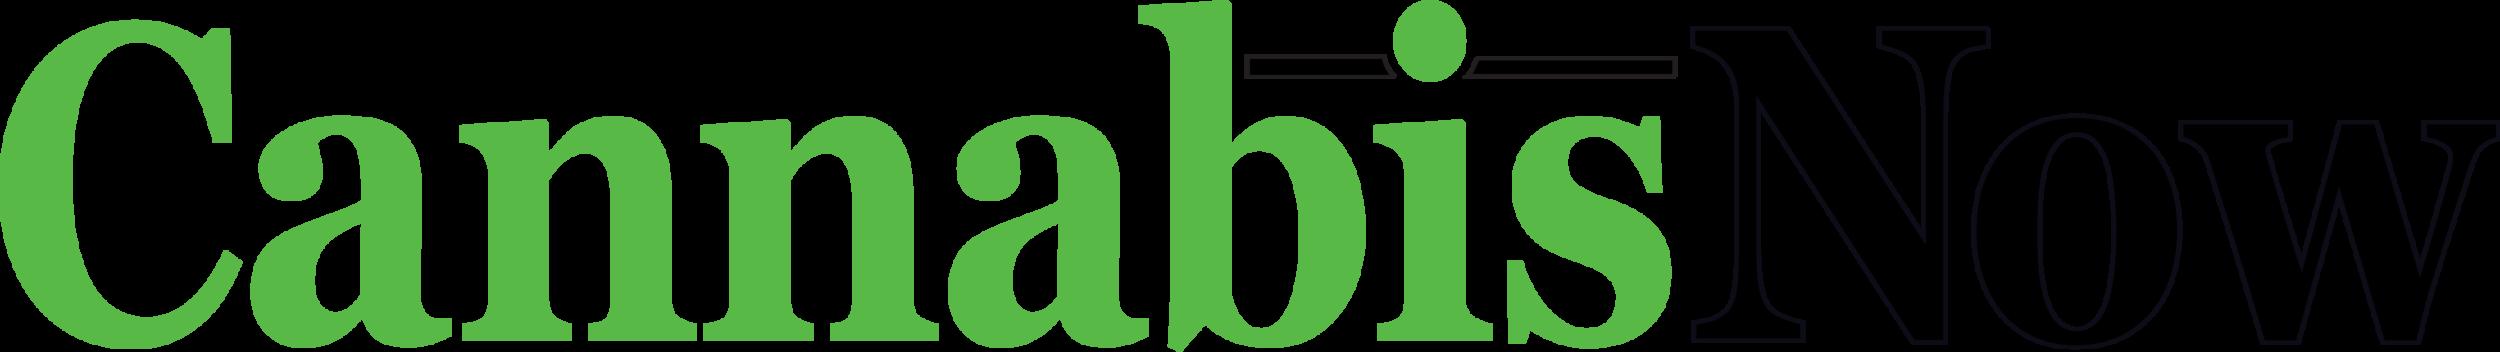 CannabisNow-logo-green-black.png